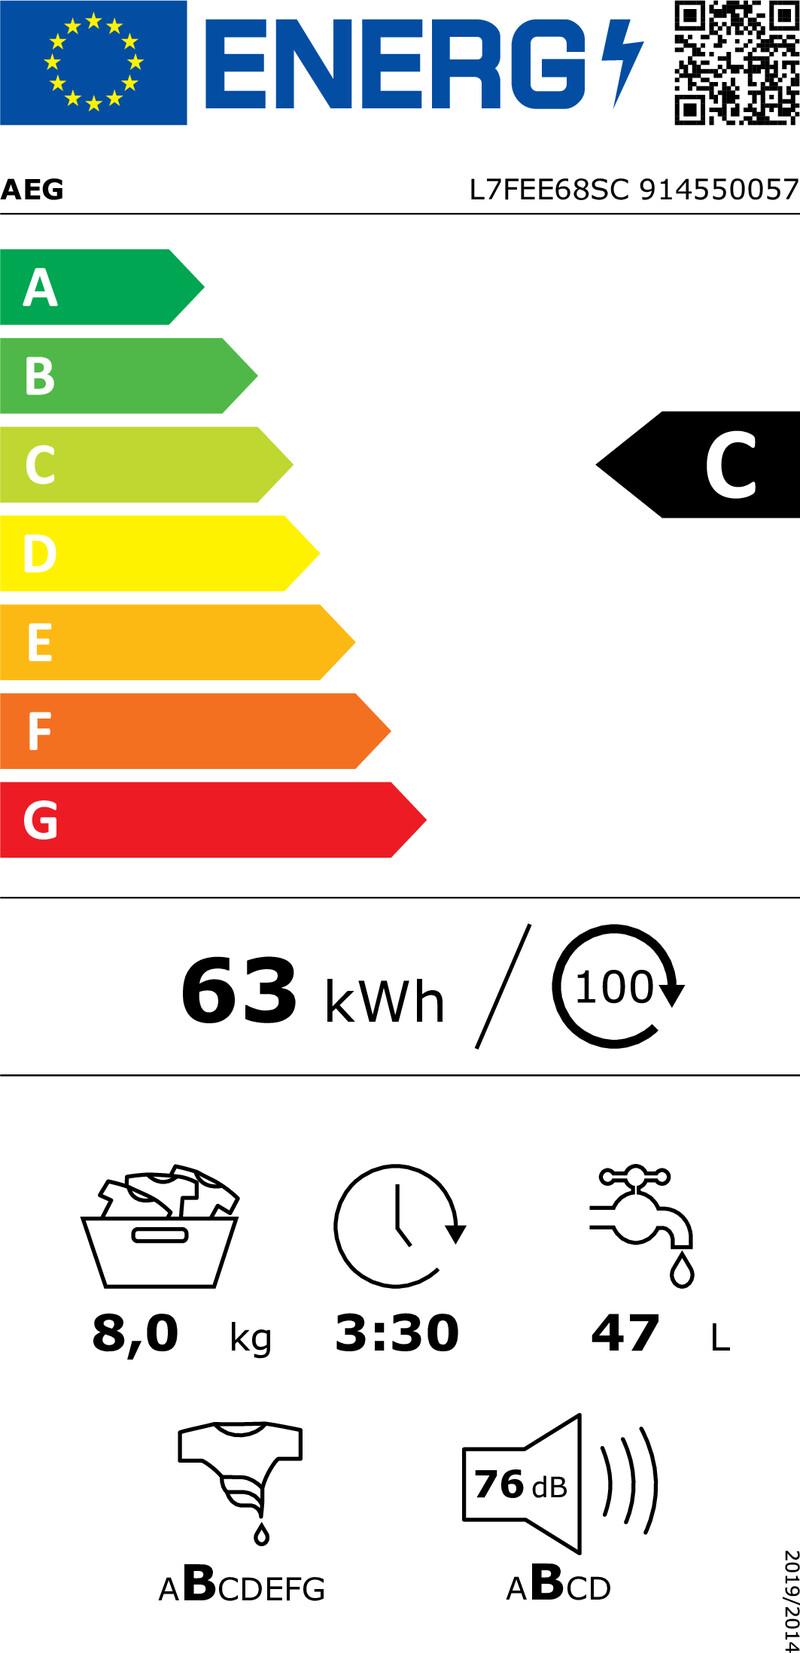 Energetický štítek AEG ProSteam® L7FEE68SC